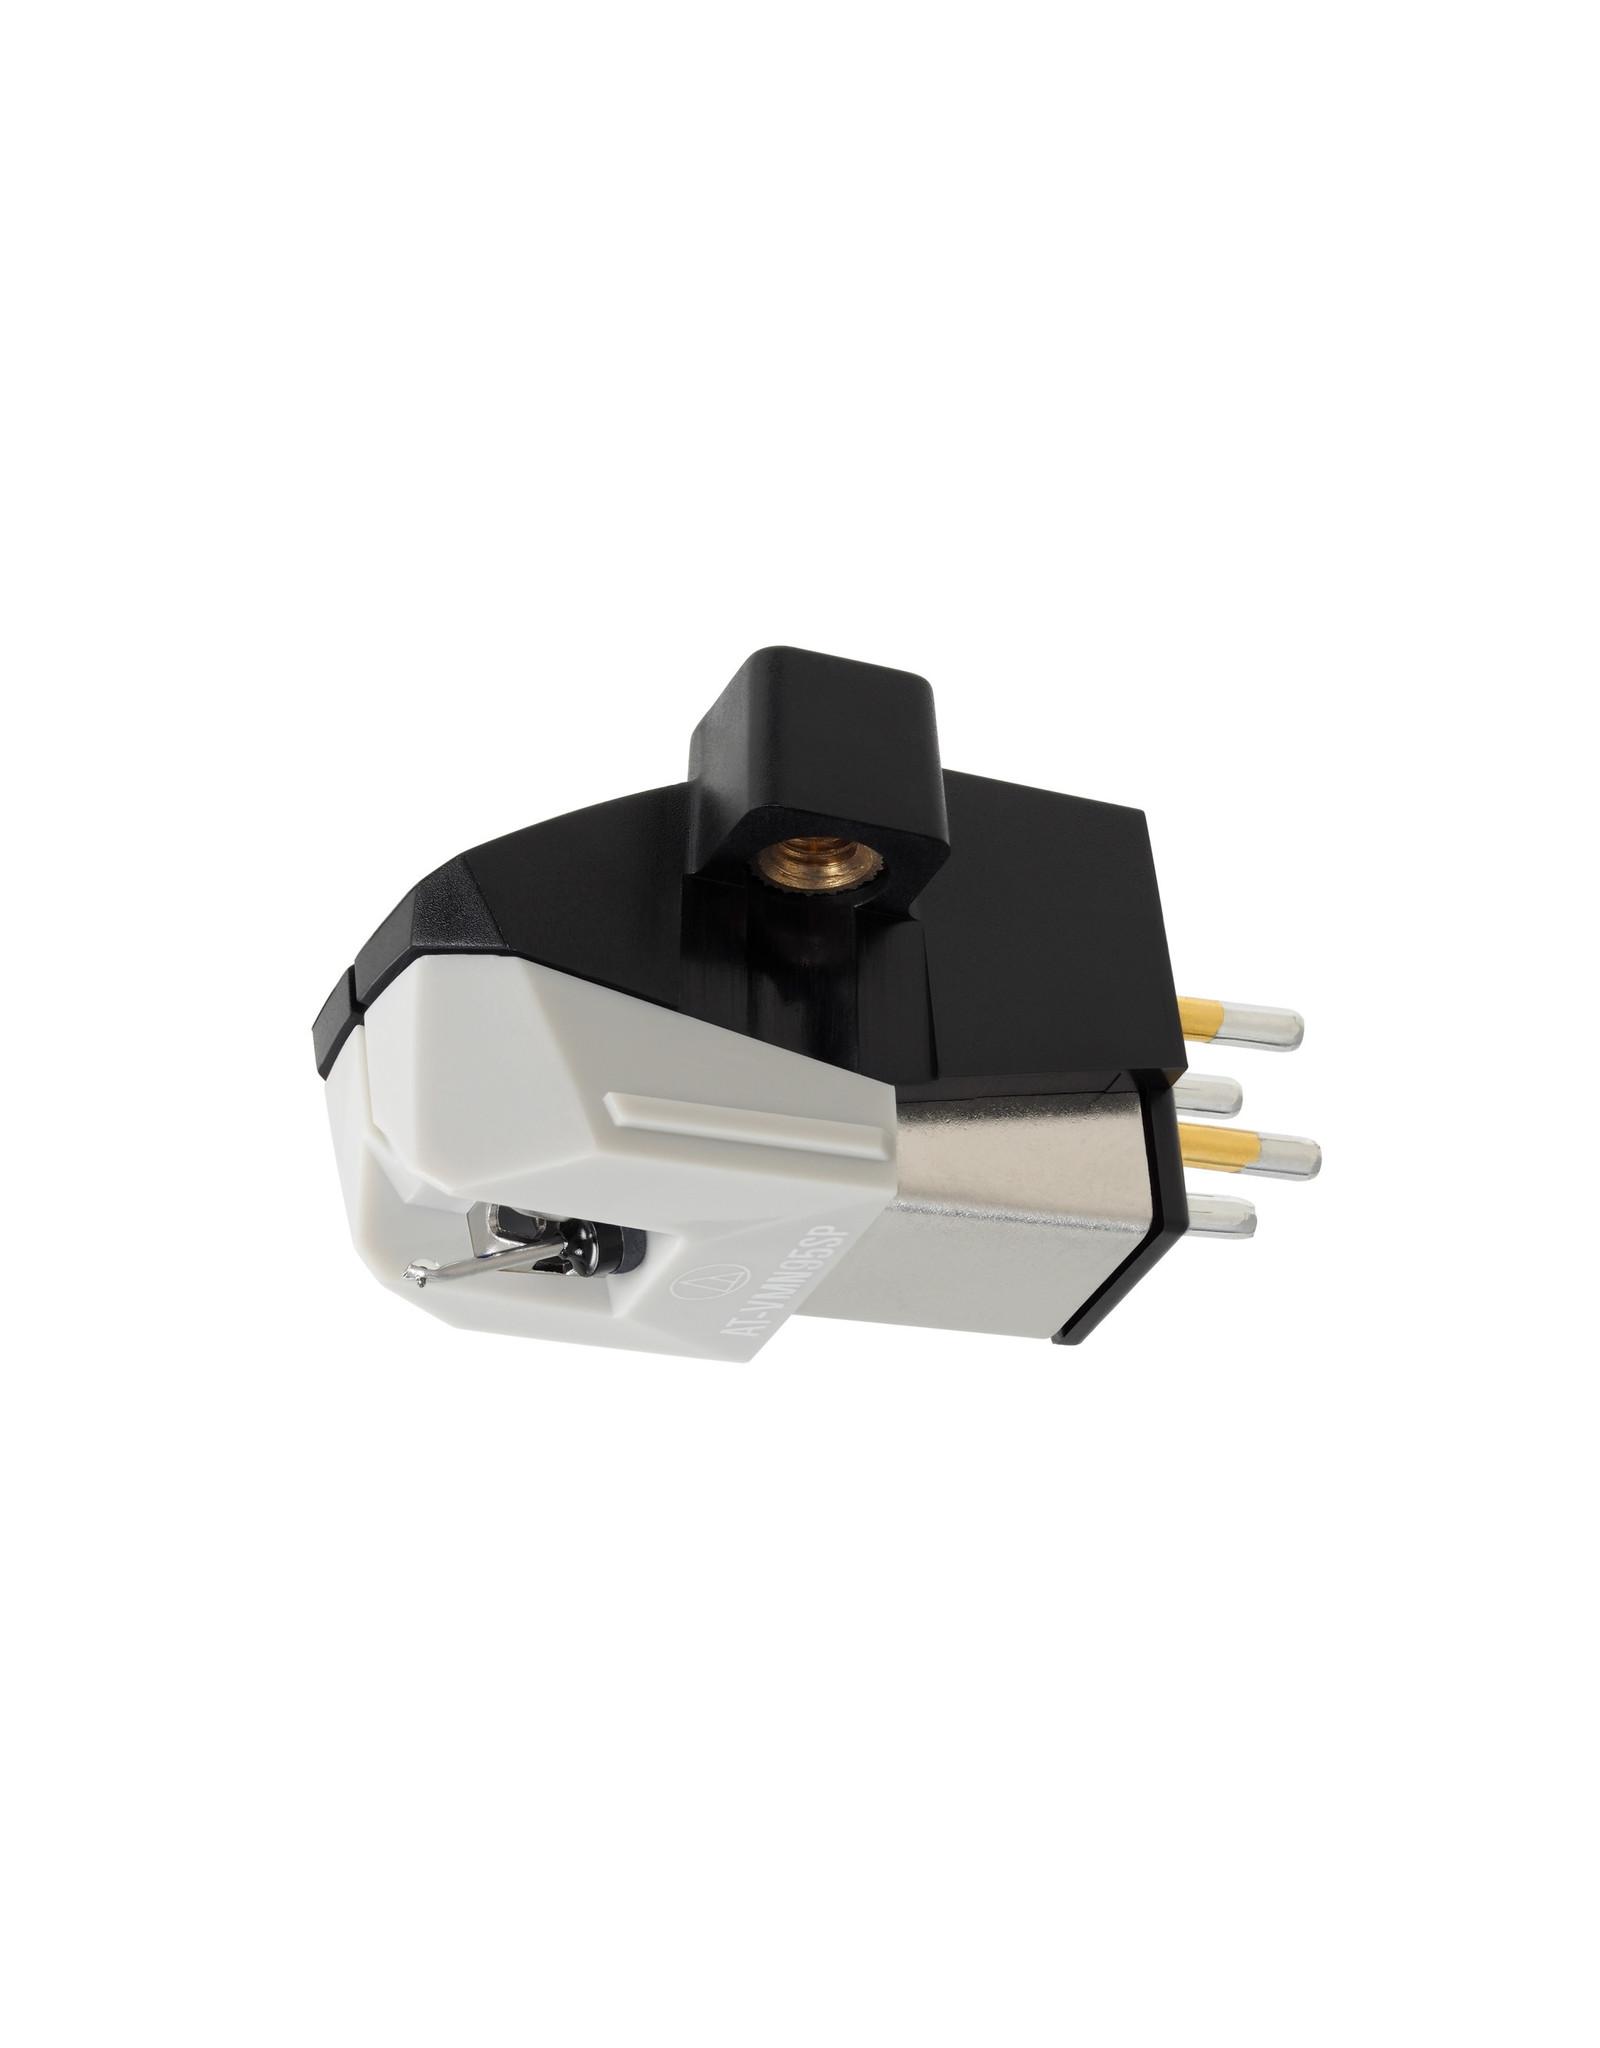 Audio-Technica Audio-Technica AT-VM95SP 78-RPM Phono Cartridge